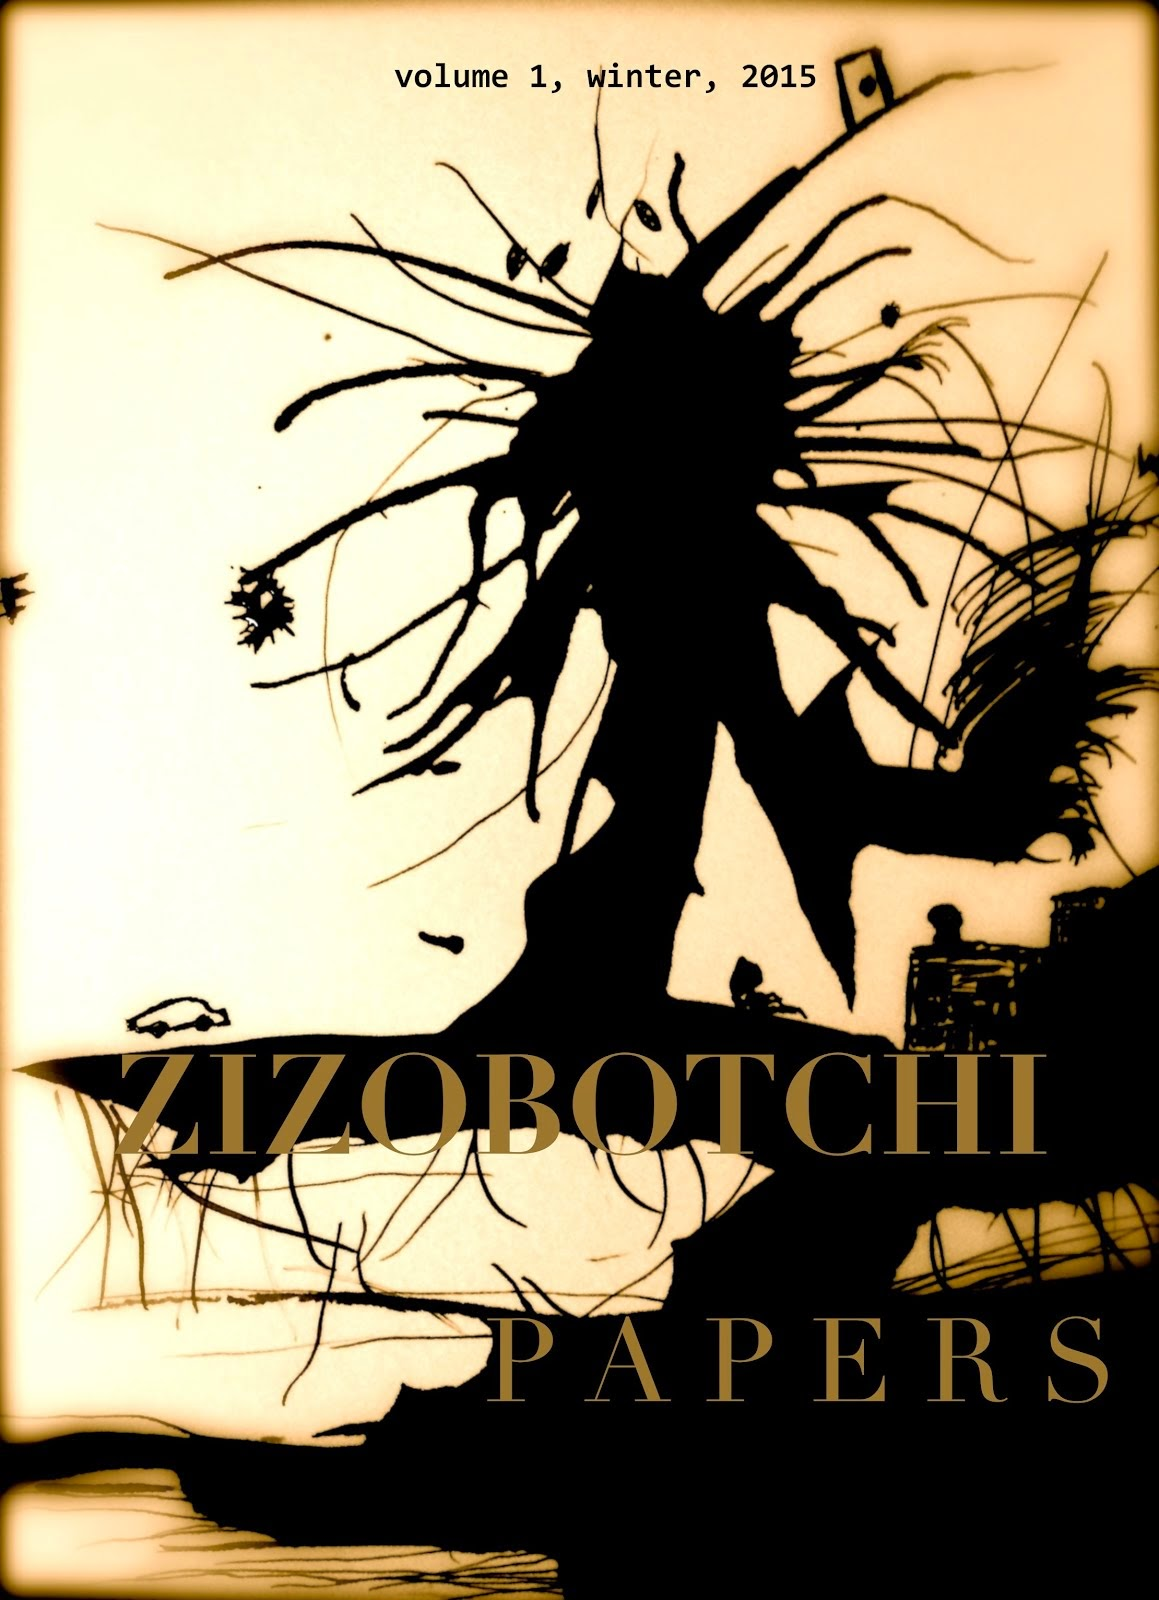 Zizobotchi P a p e r s